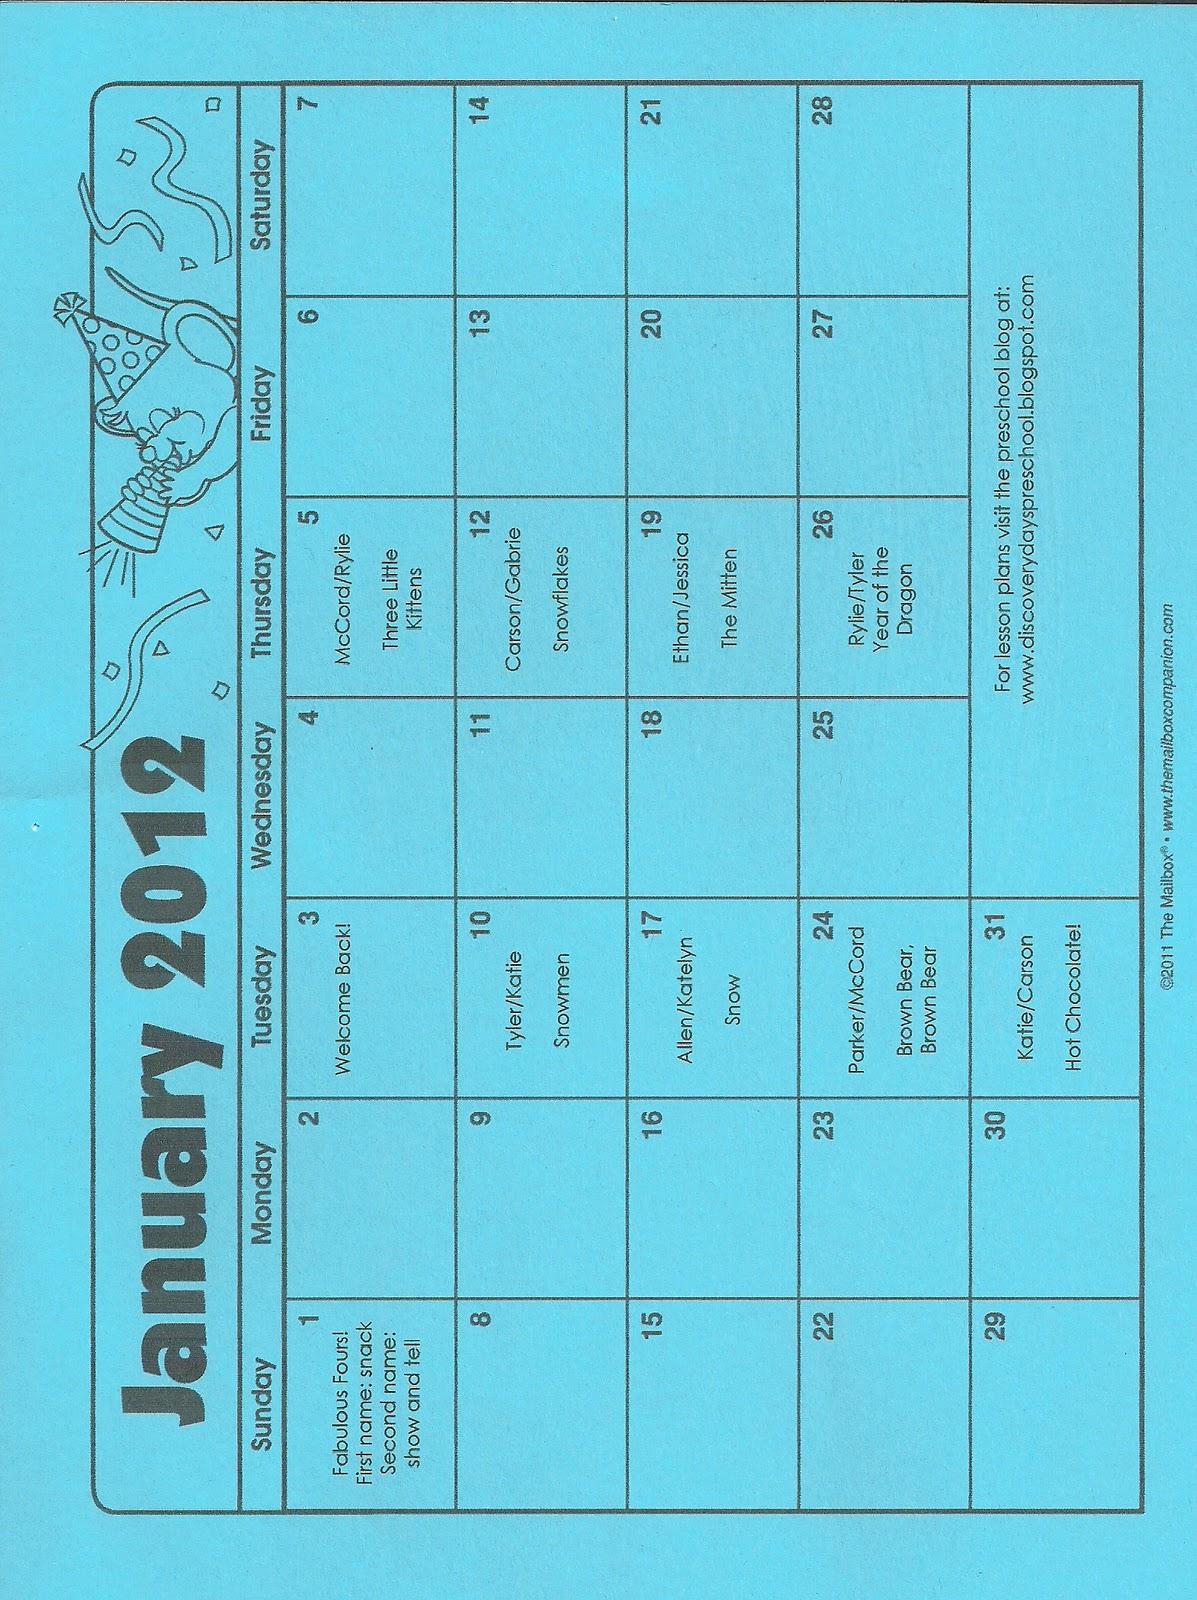 January Calendar Preschool : Discovery days preschool january calendar and lesson plans